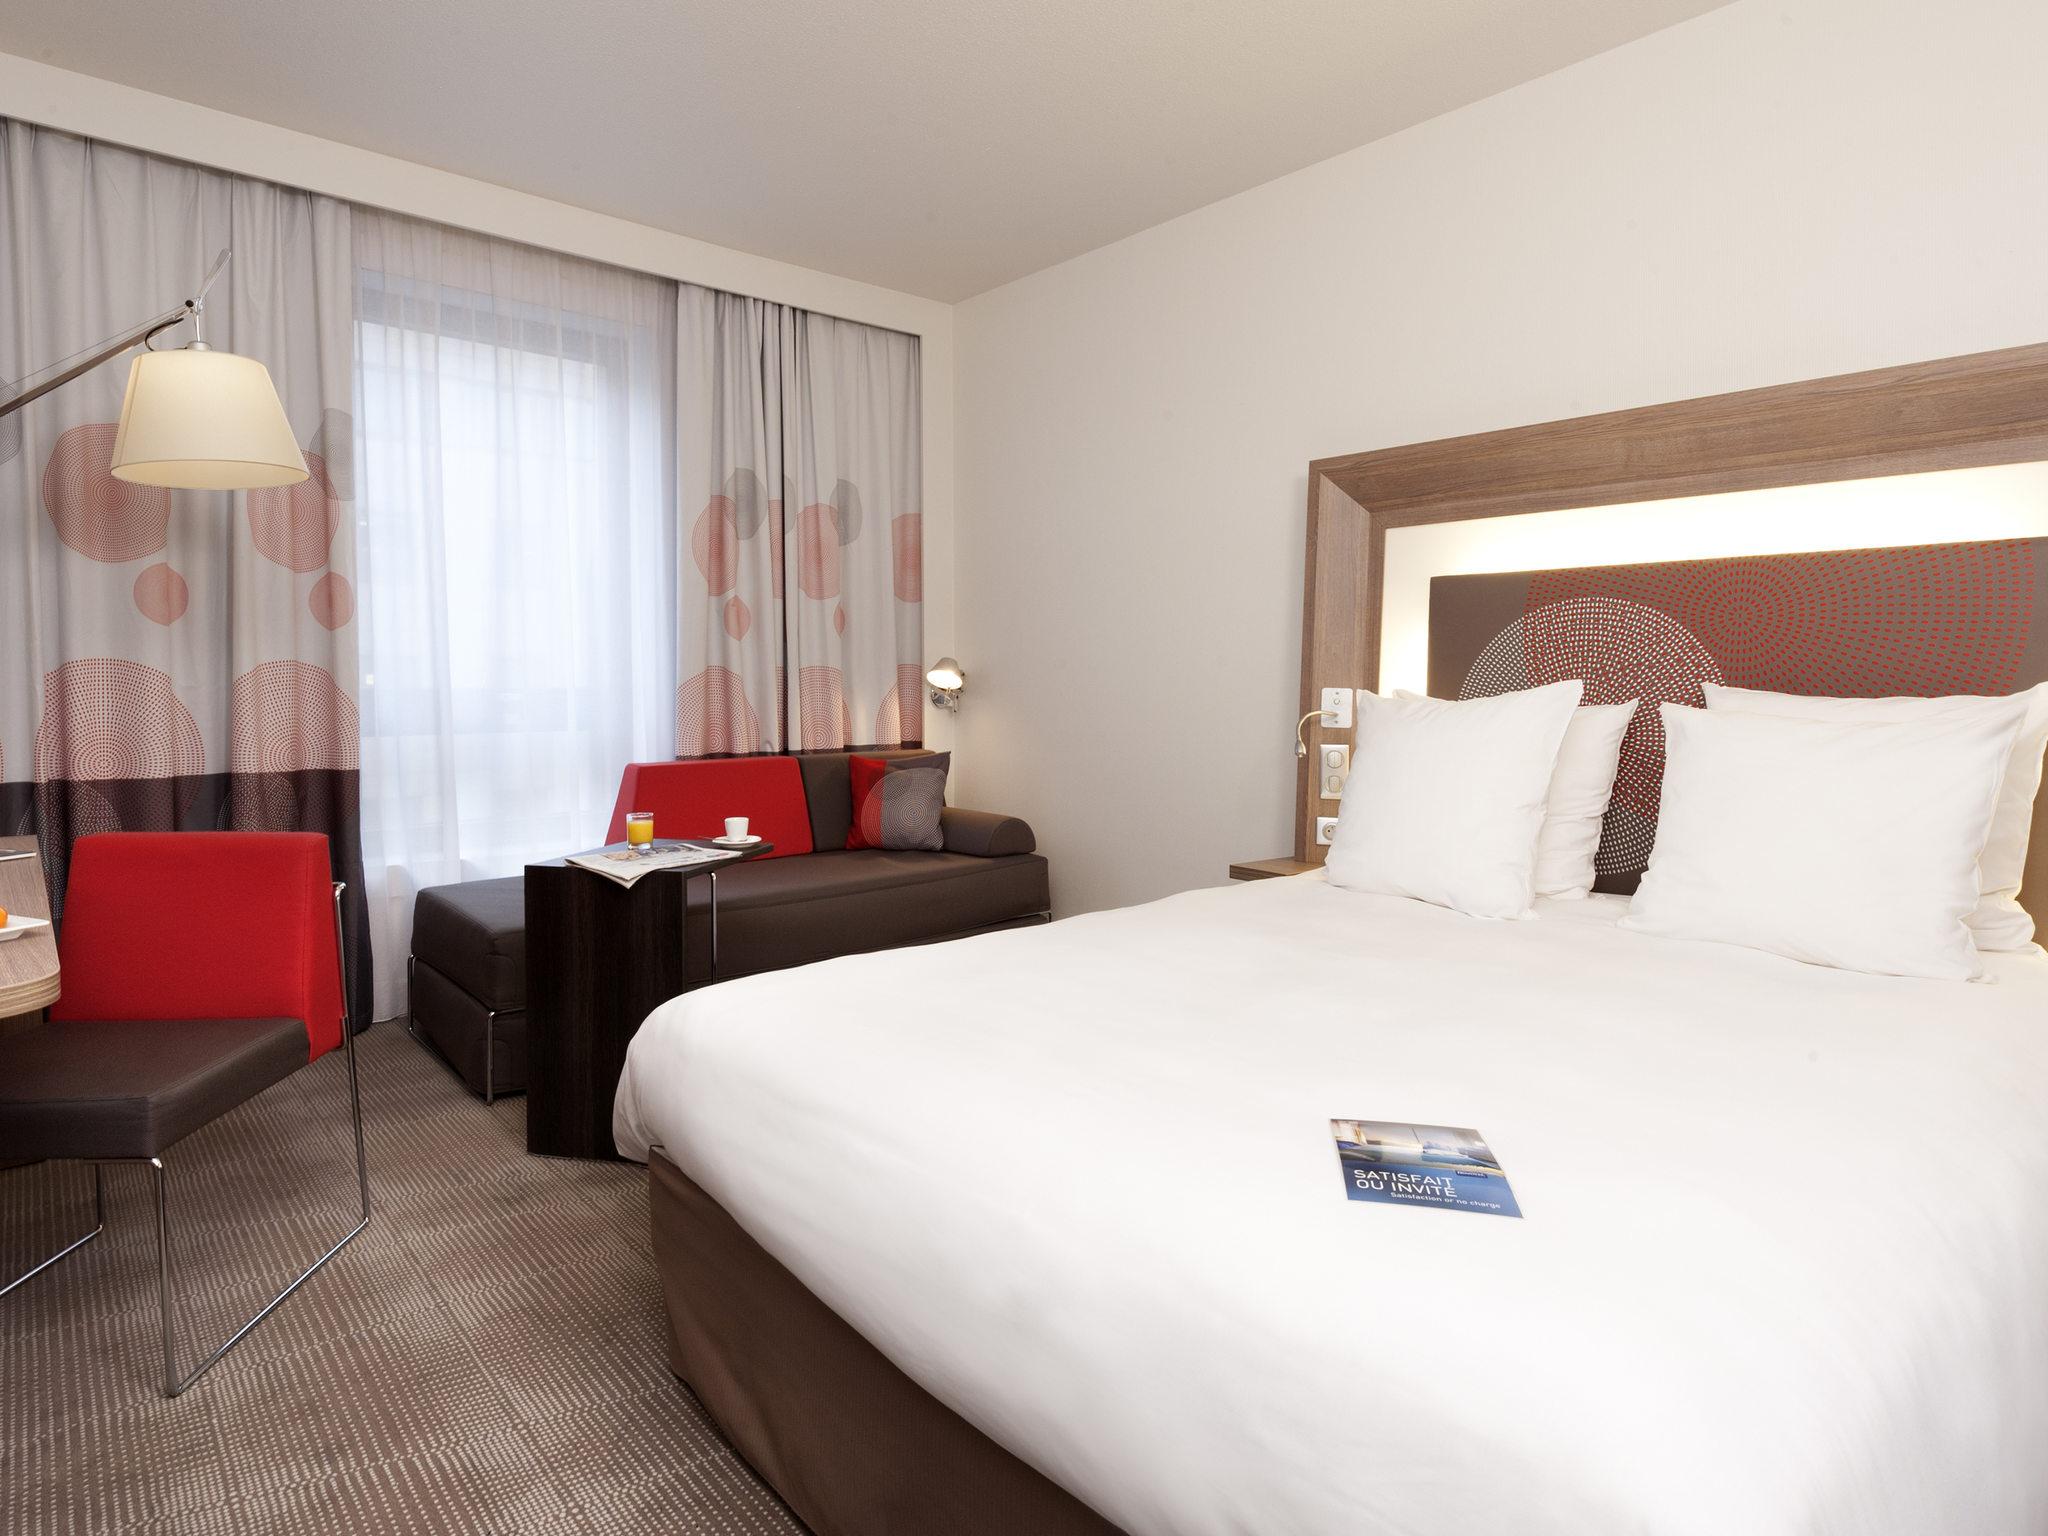 hotel em rueil malmaison novotel paris rueil malmaison. Black Bedroom Furniture Sets. Home Design Ideas